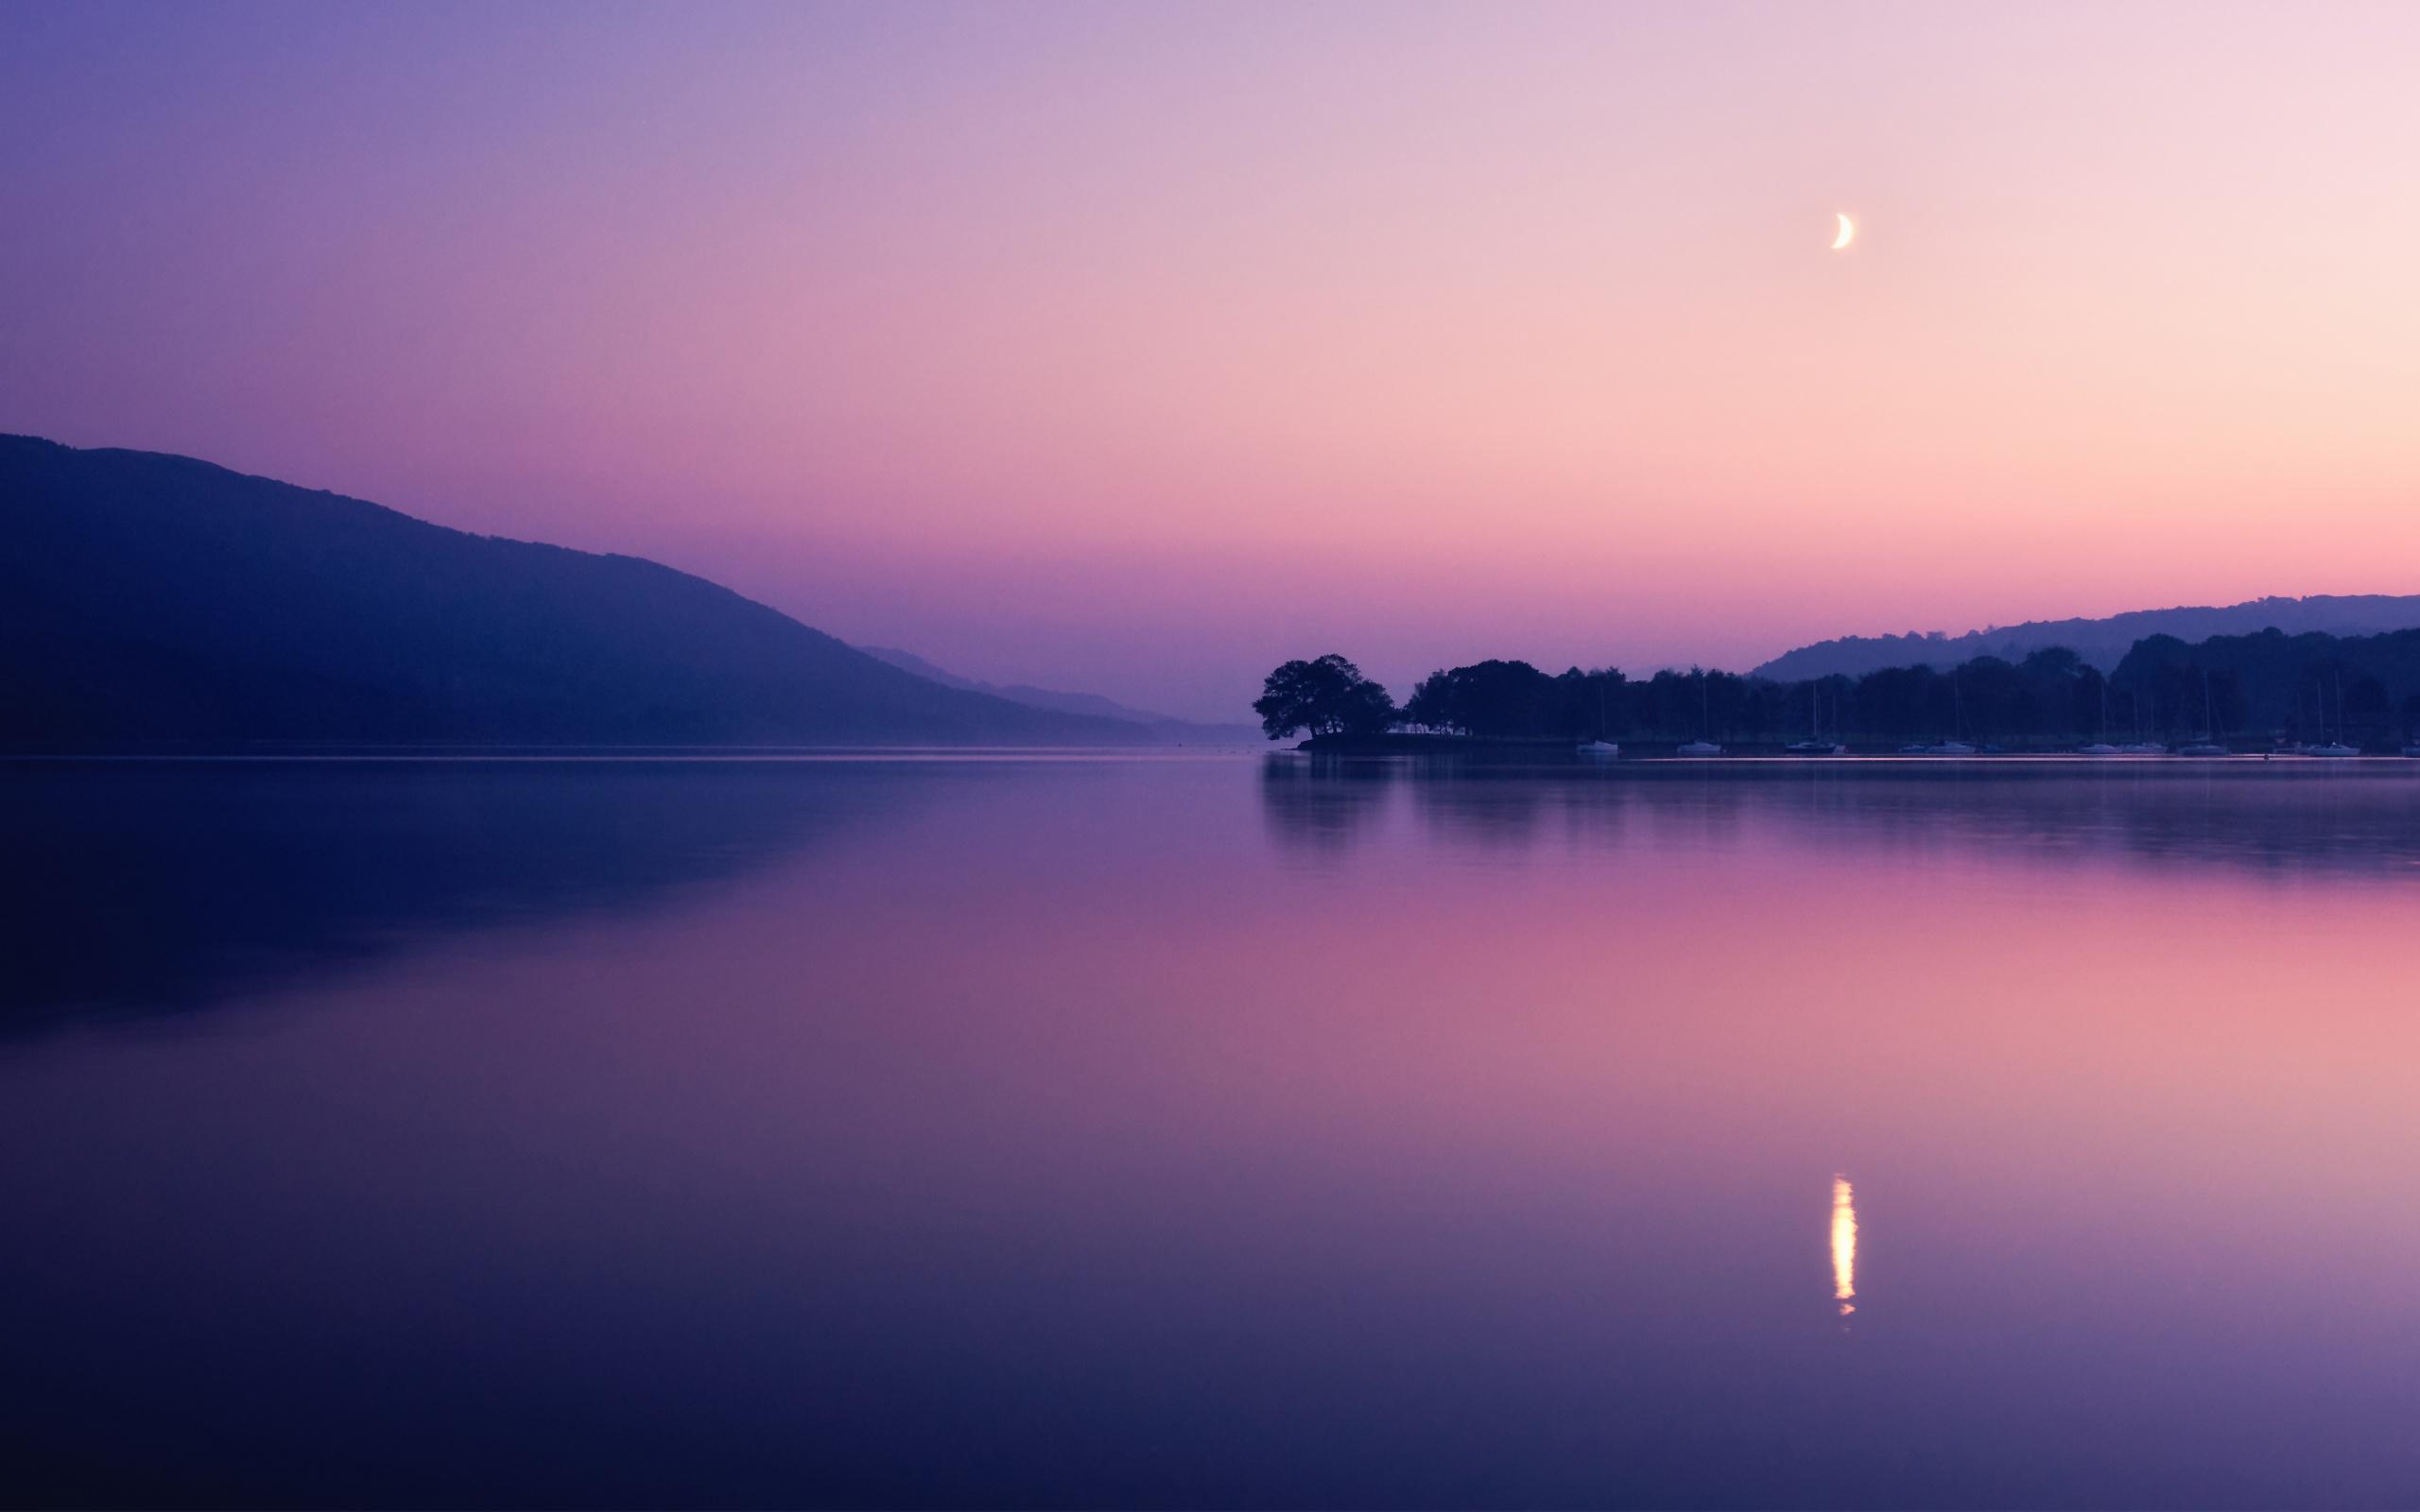 озеро сумерки the lake twilight загрузить